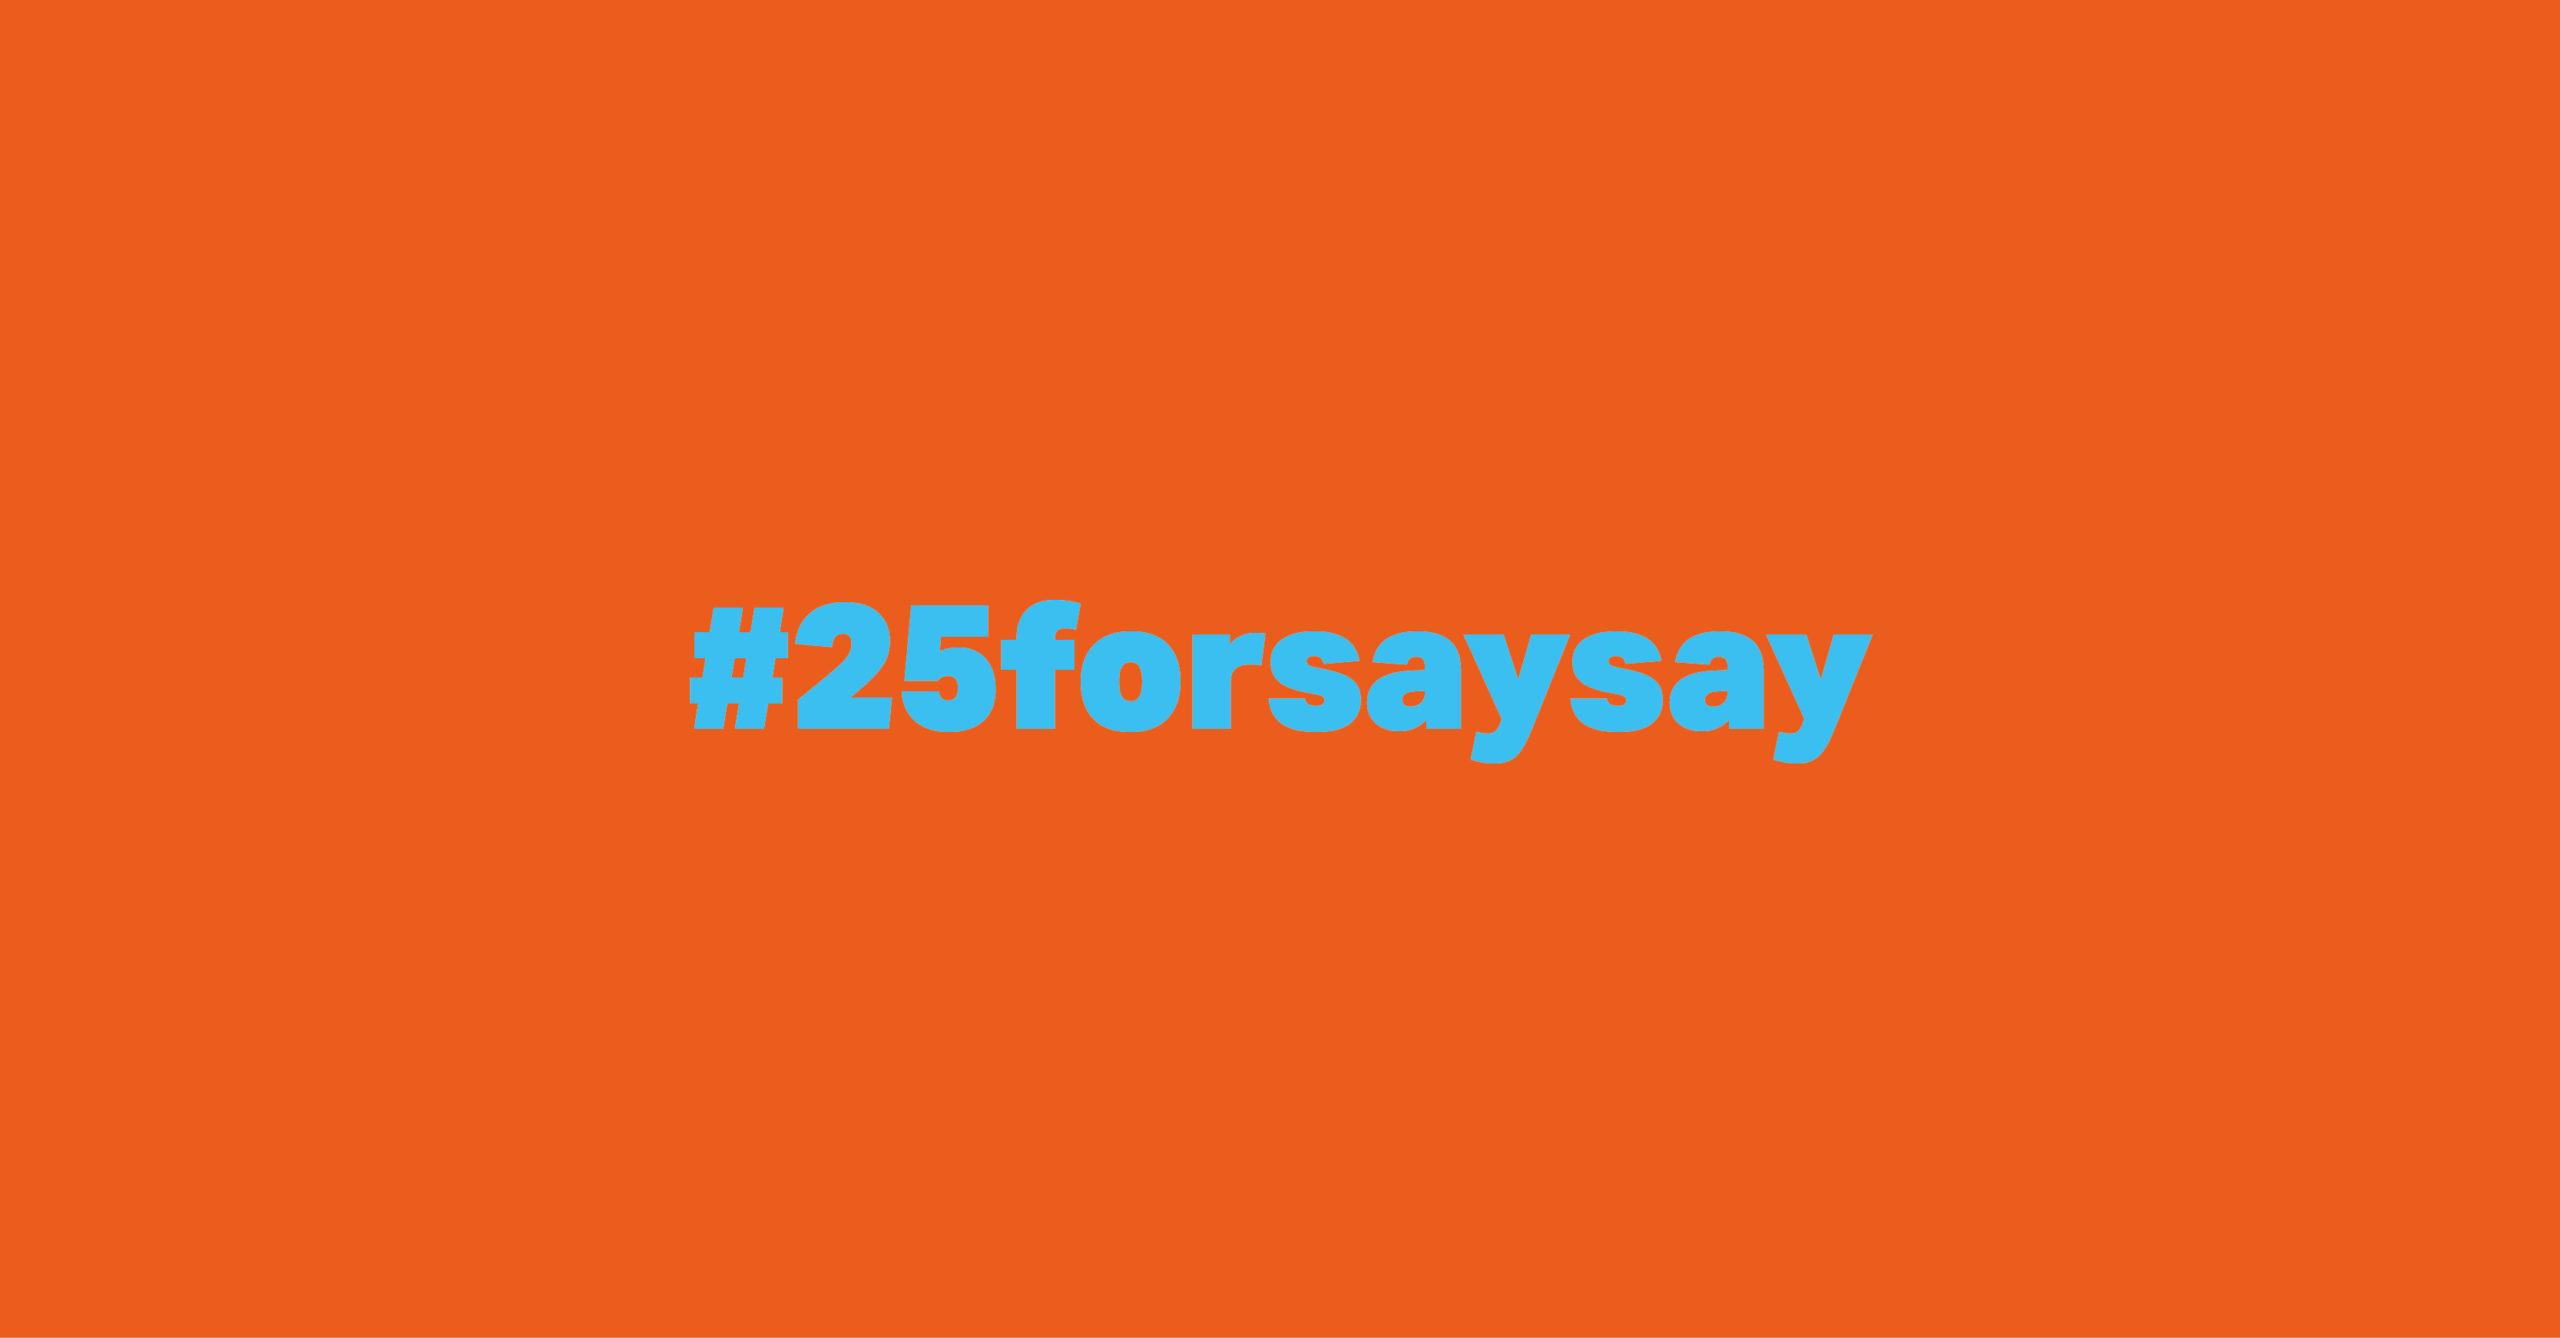 #25forsaysay soulful hip-hop radio Aufruf Blogbeitrag 800x418, 300 dpi